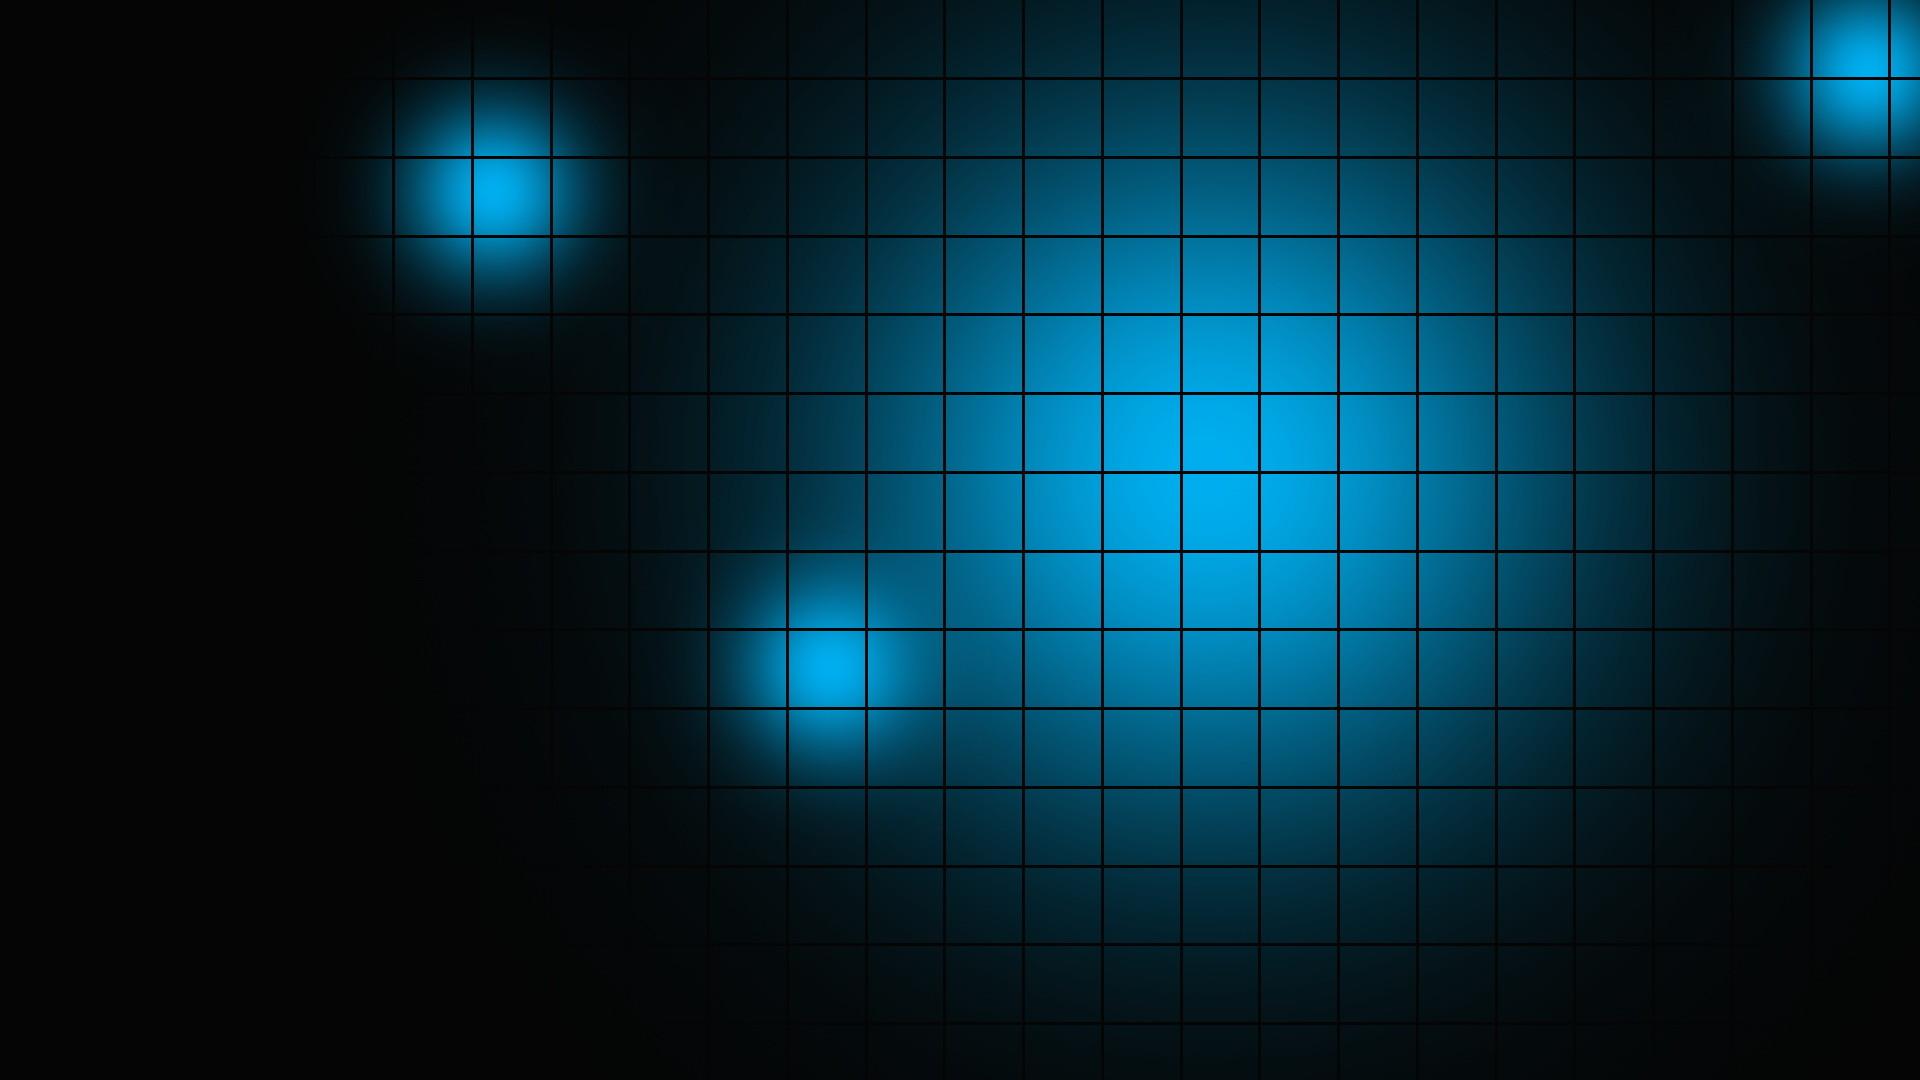 Blue Wallpaper For Background 19